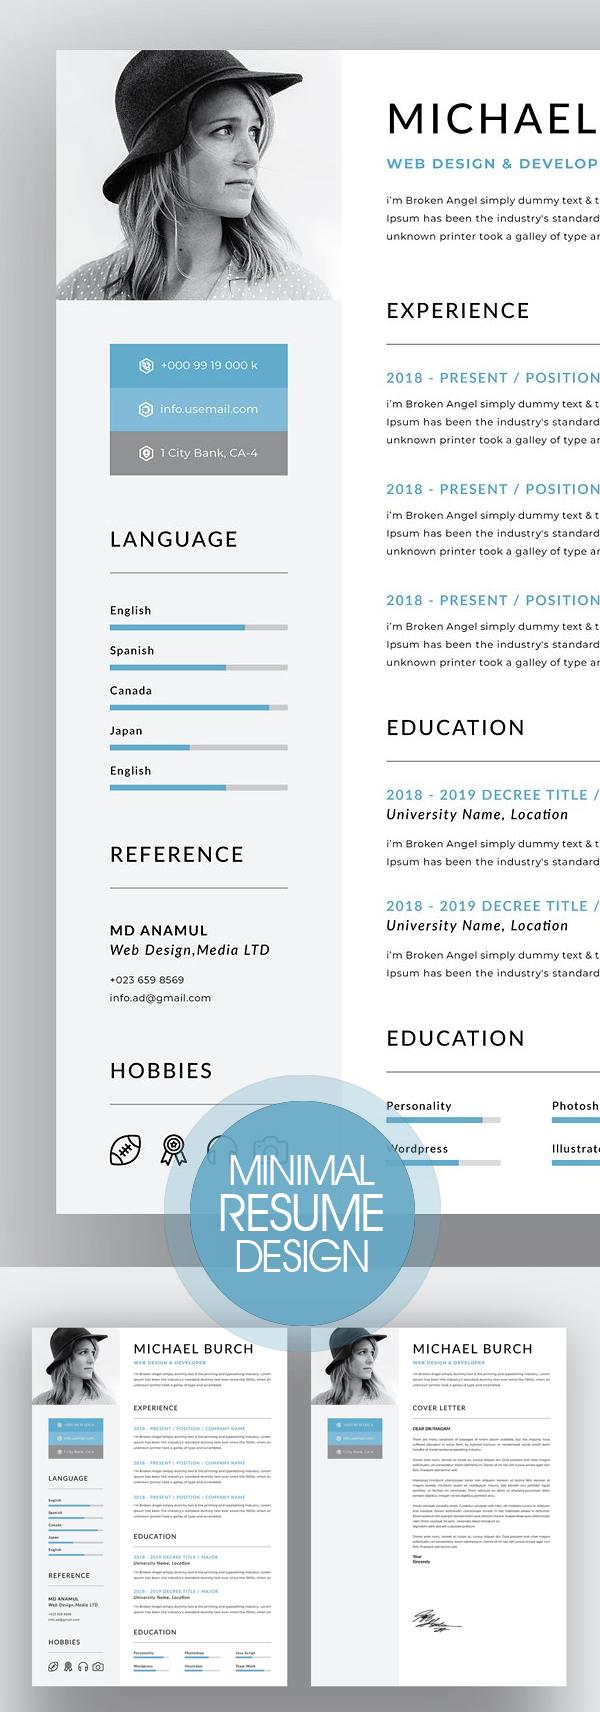 Creative Minimal Resume Design 2018